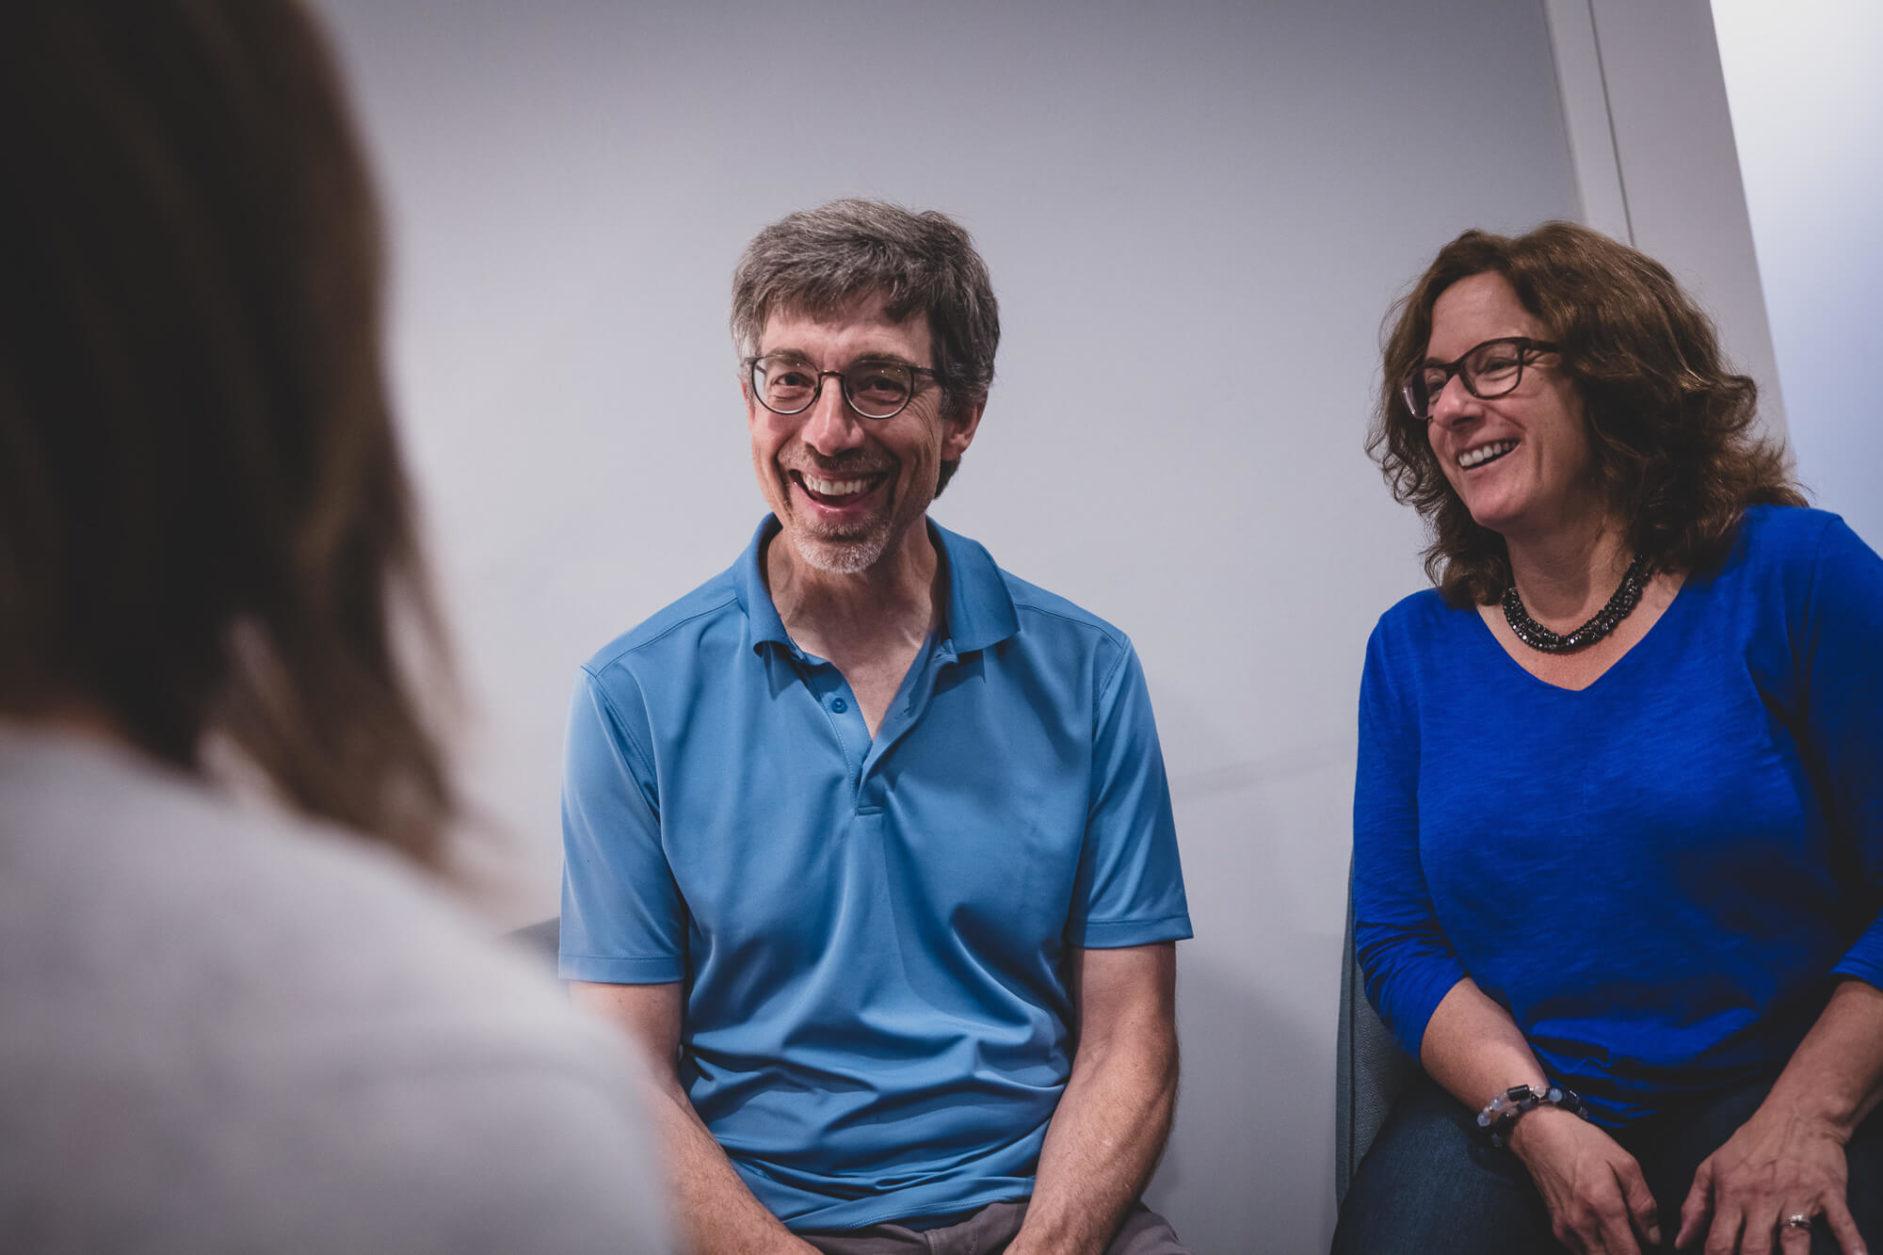 Patient Care Coordinator personal interview